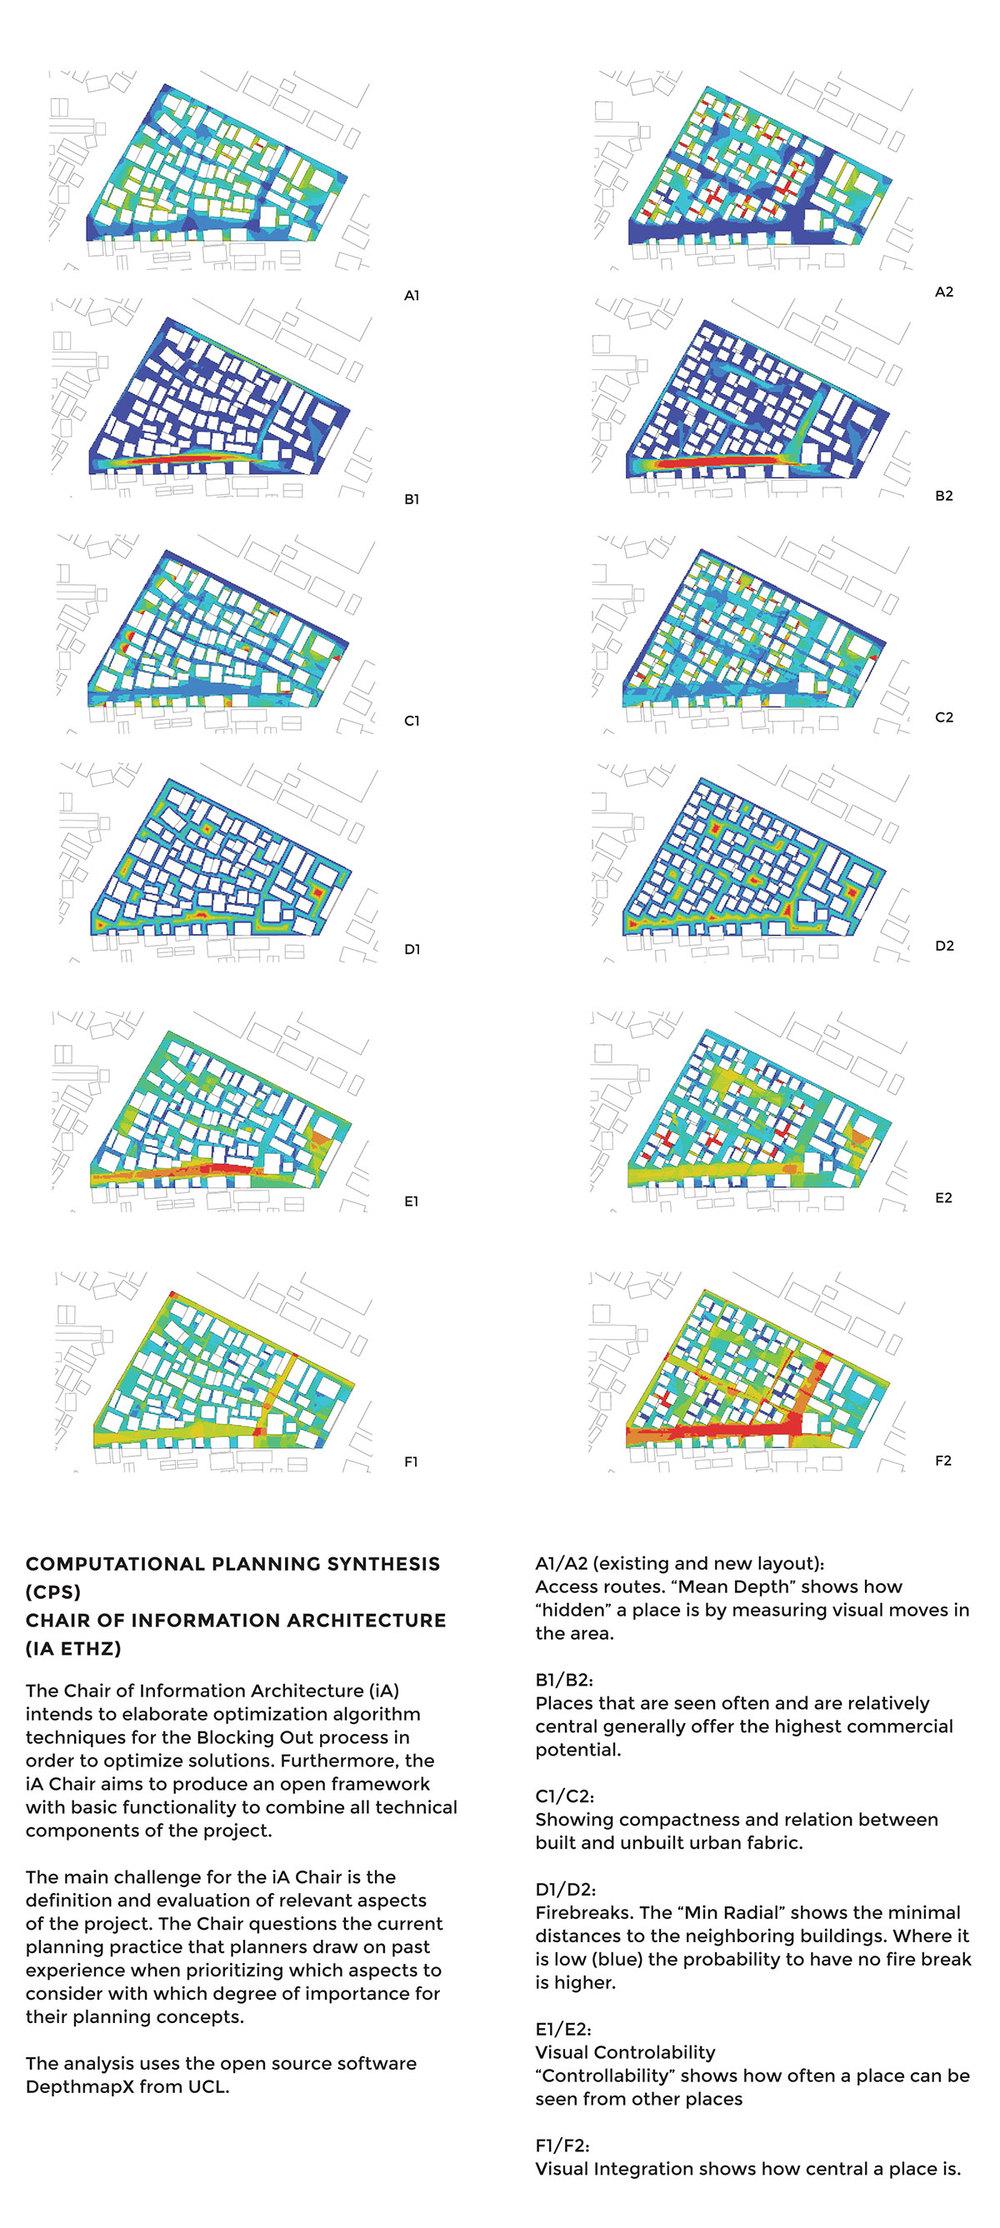 Digital Master planning Analysis